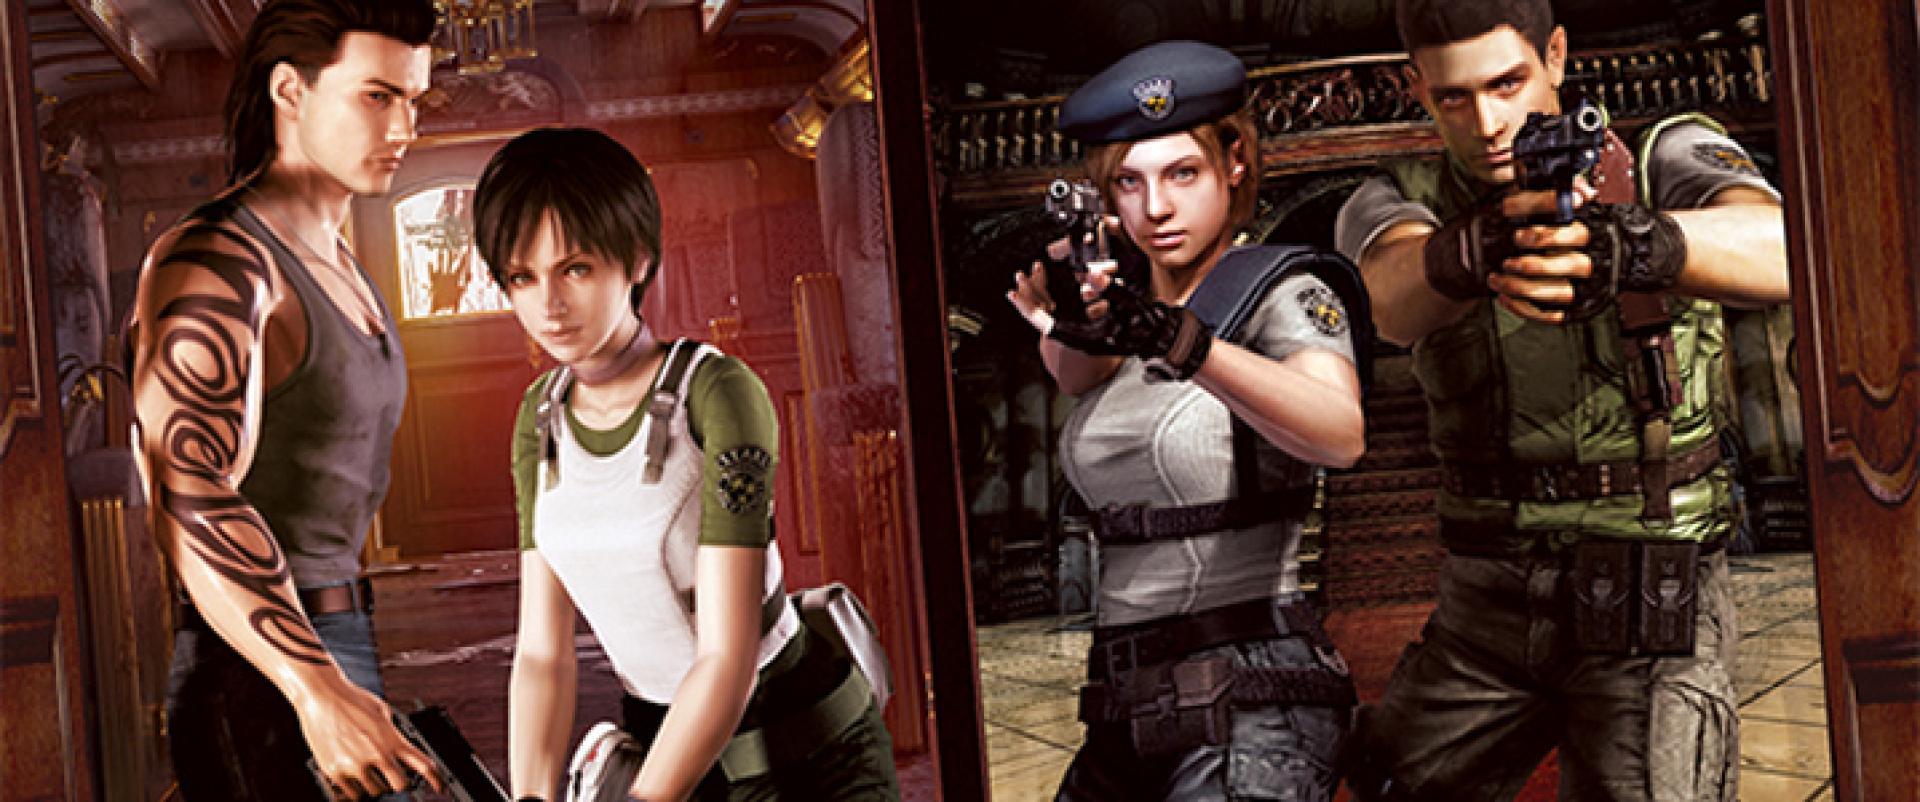 CreepyGames: Resident Evil, Silent Hills, Killer Floor 2